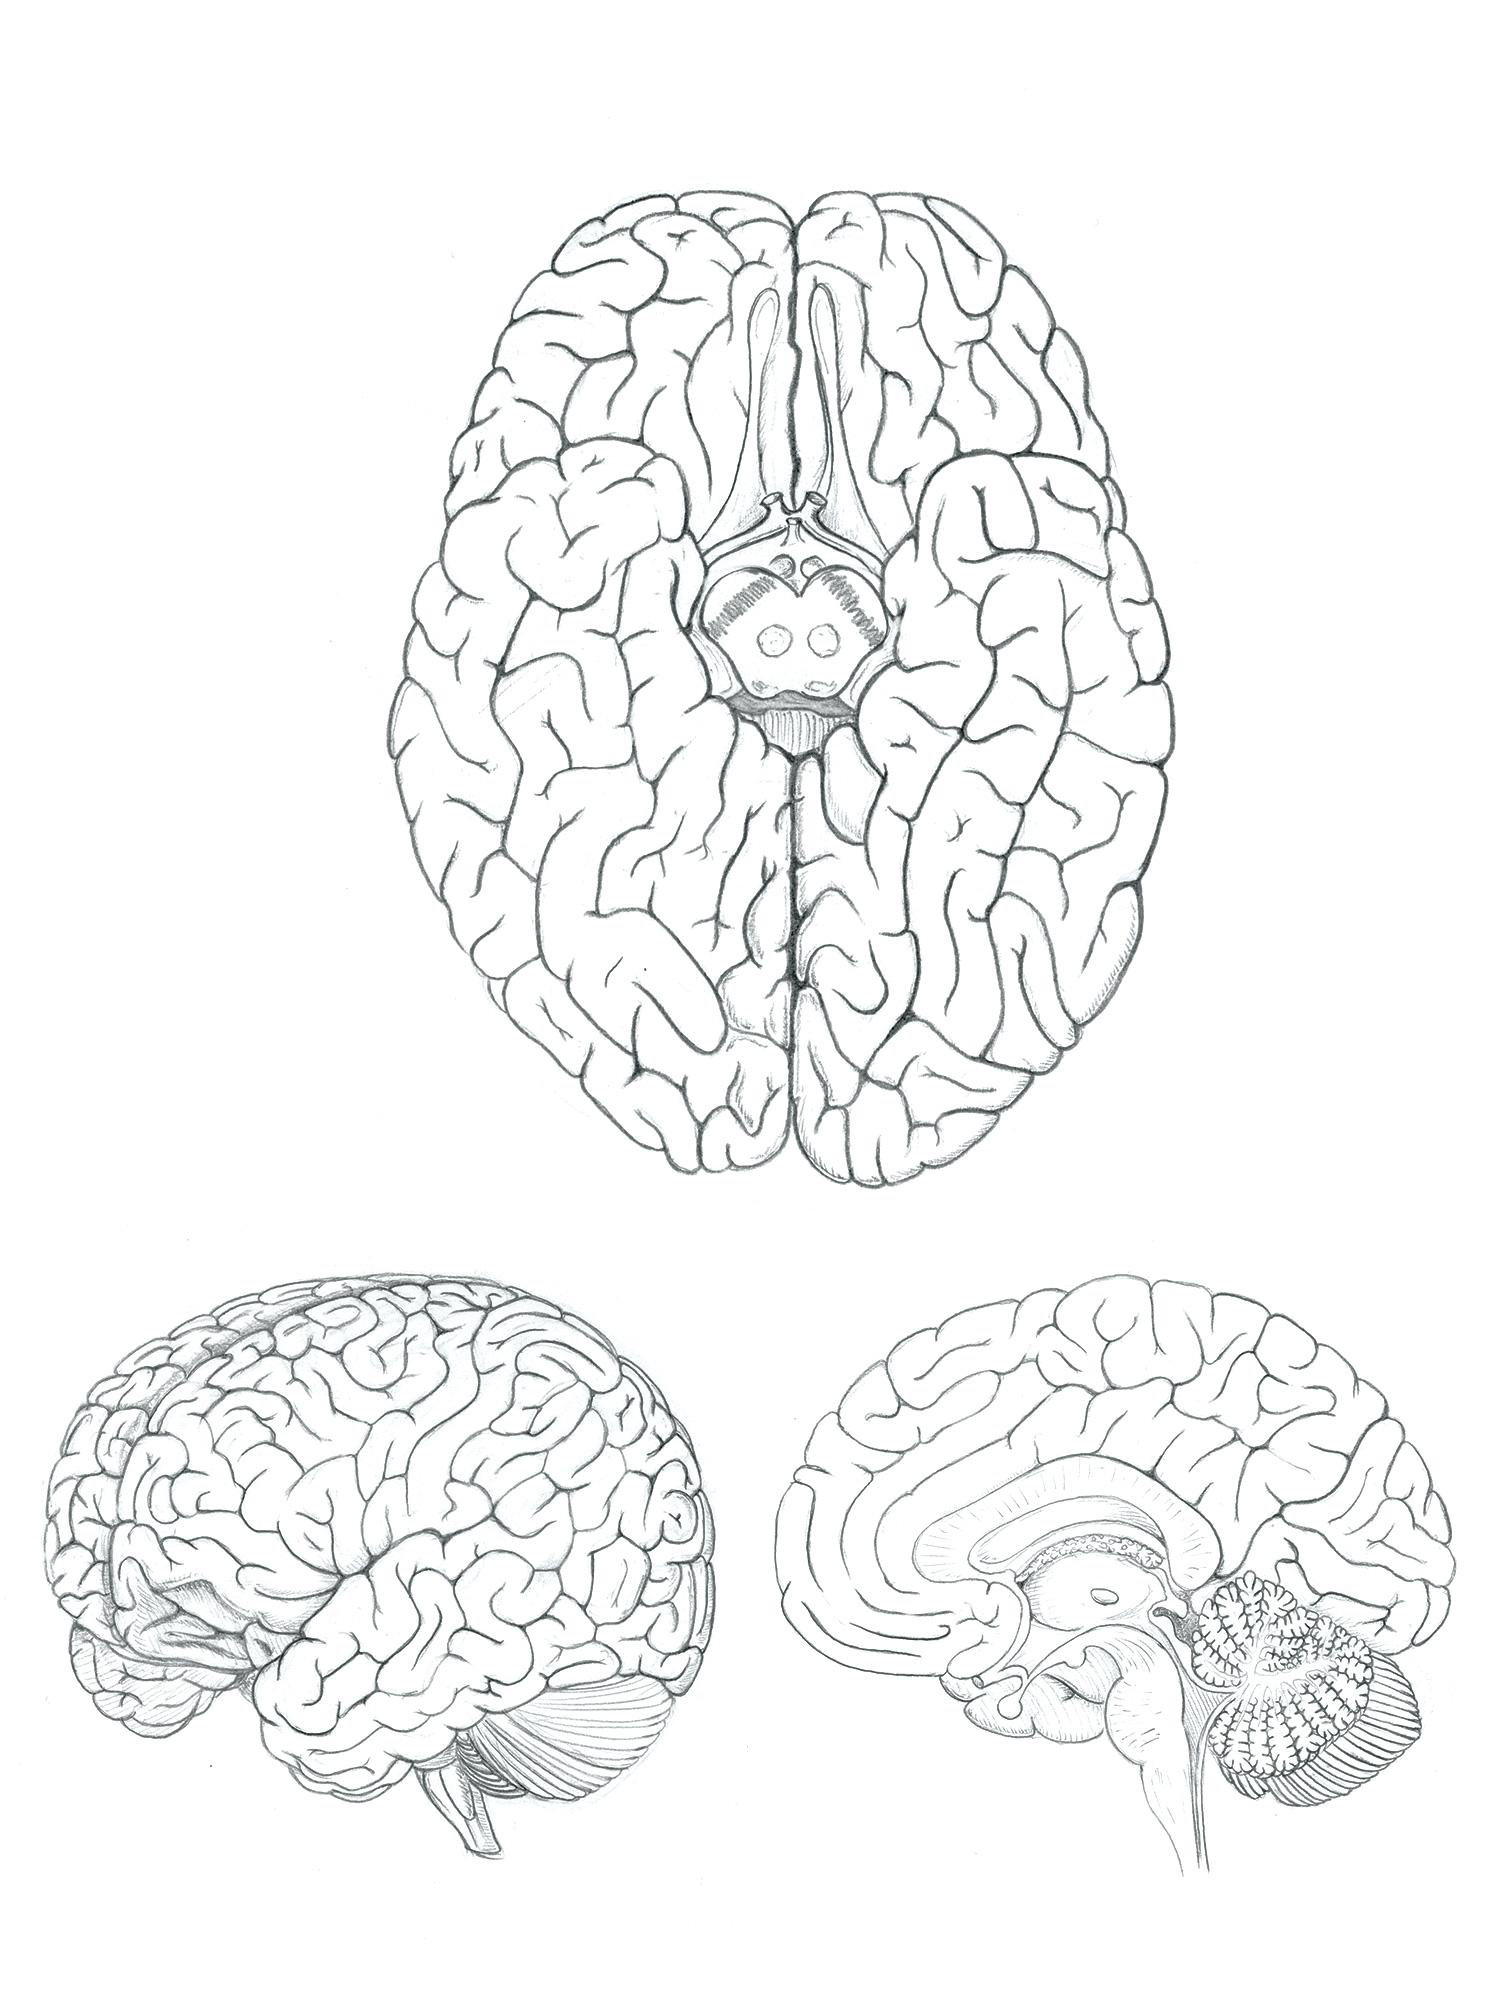 Brain-Sketch.jpg